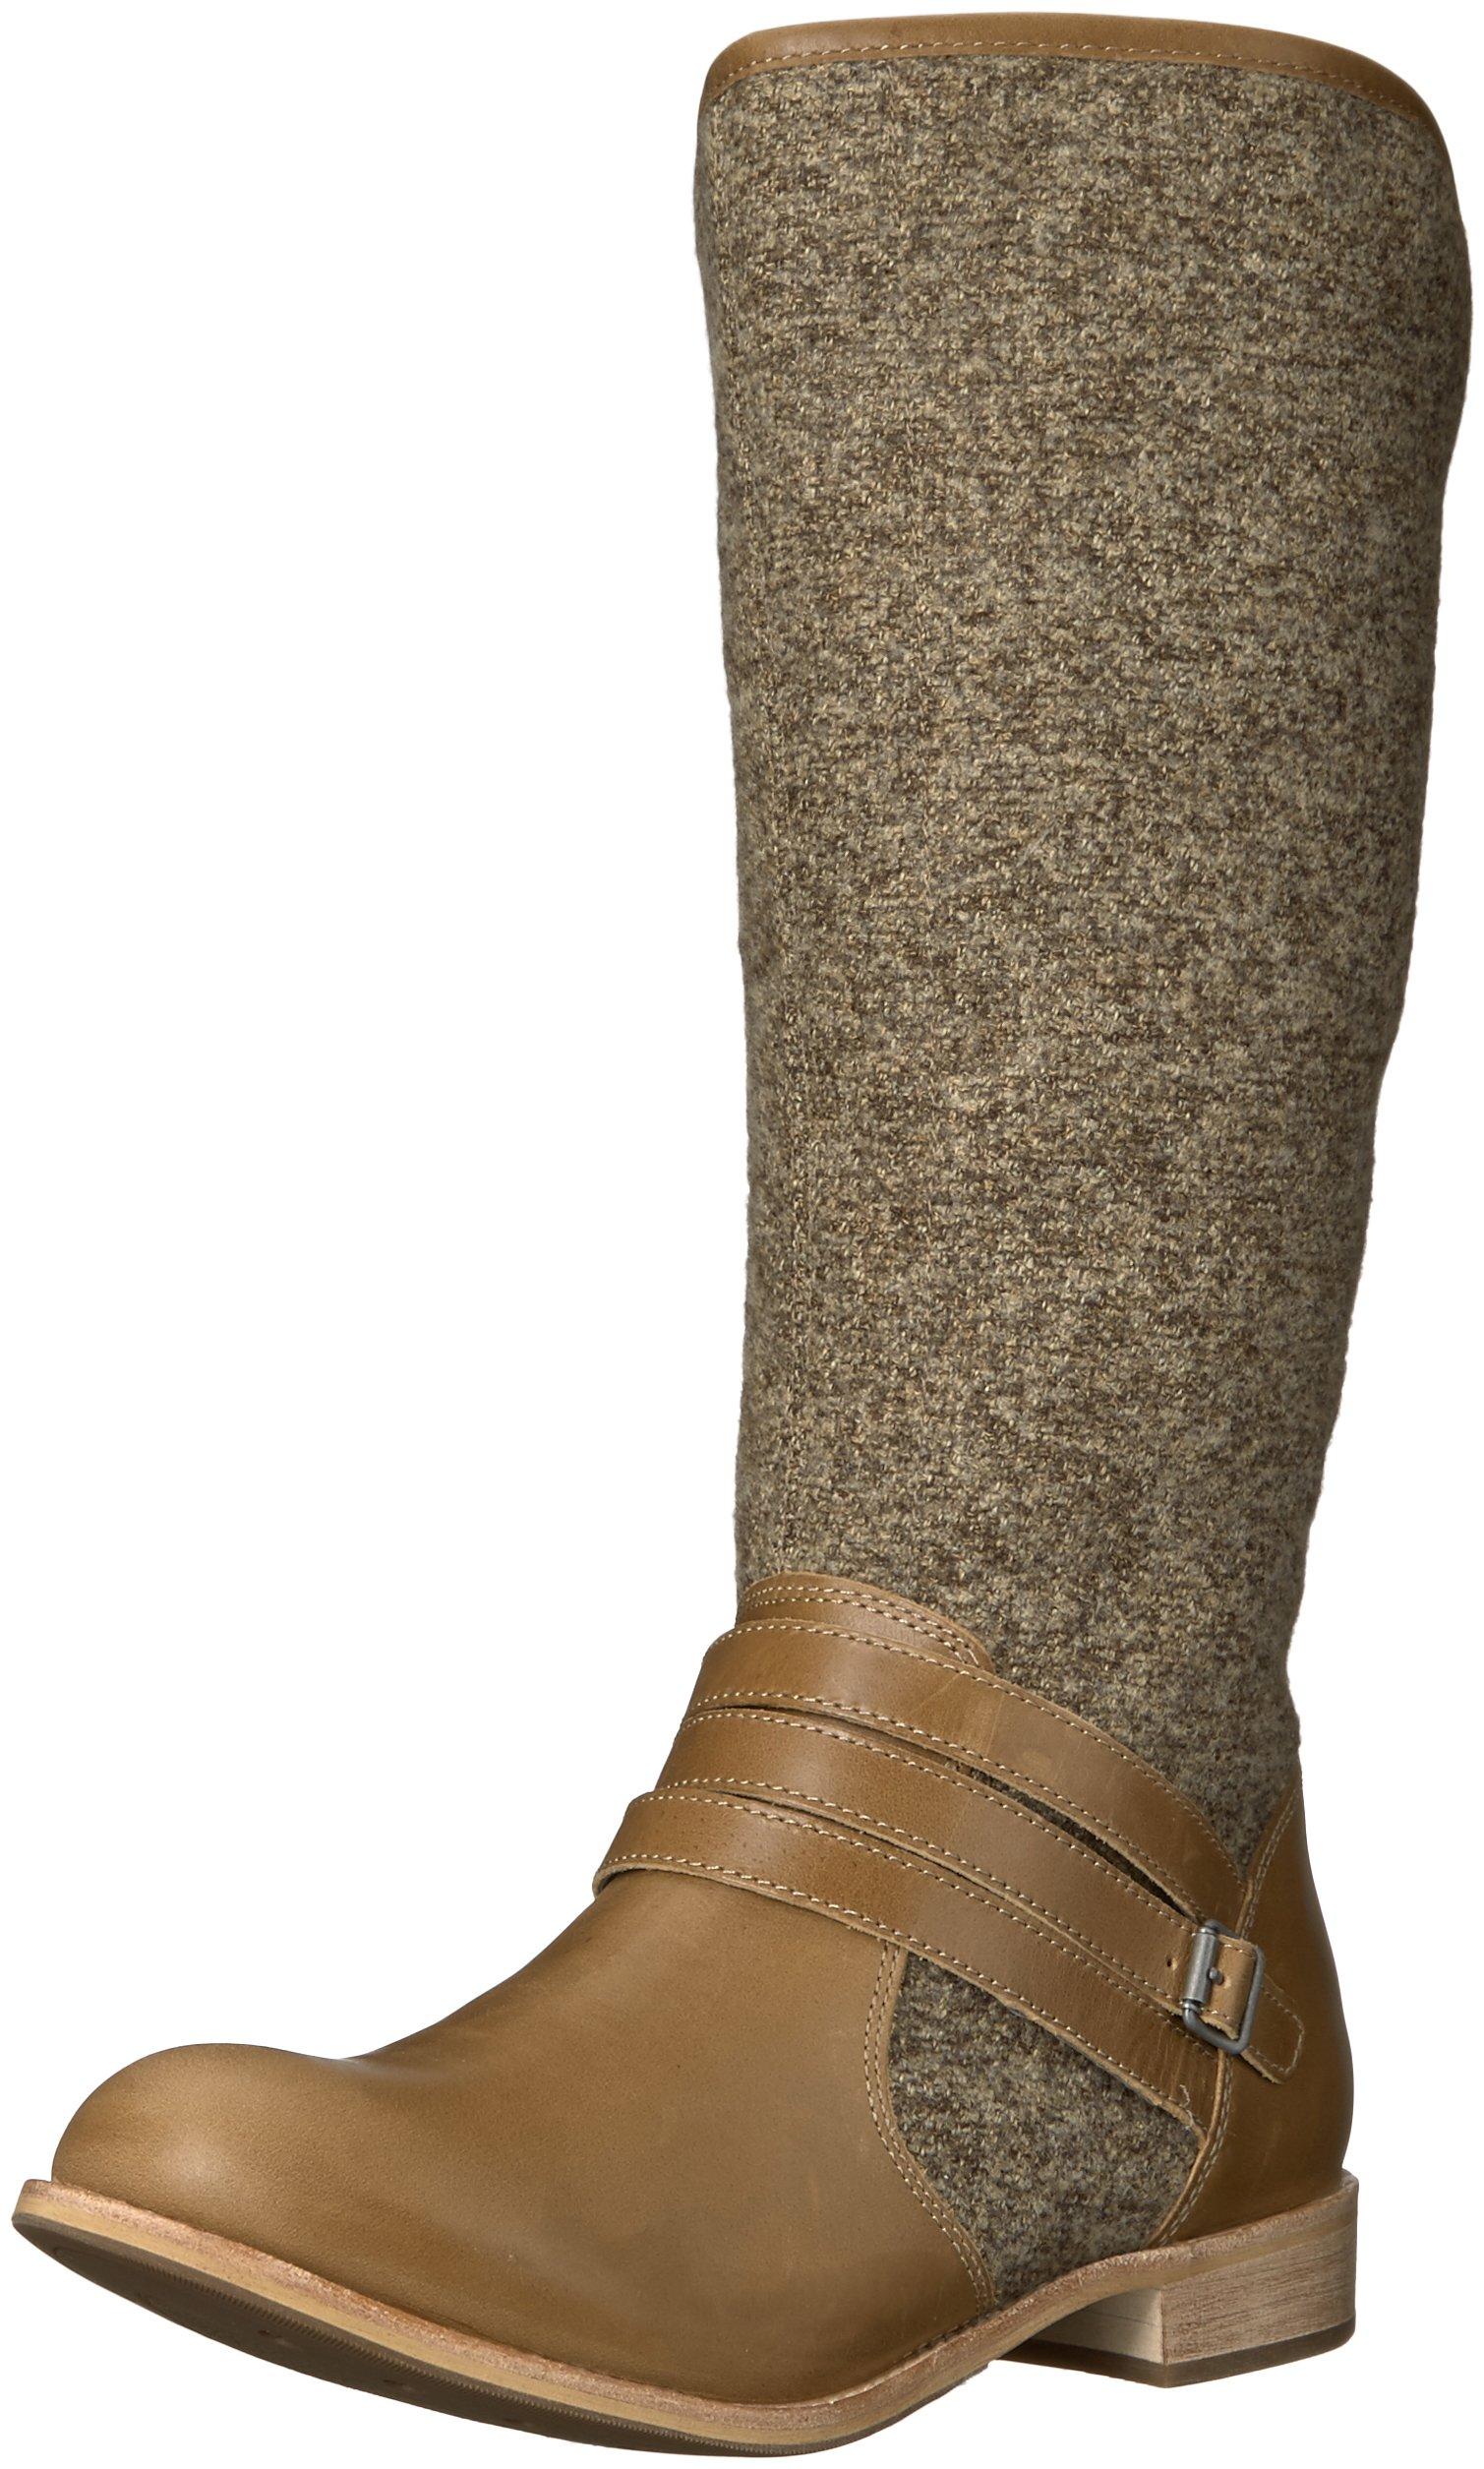 Caterpillar Women's Sabrina Wool Boot, Womens Warm Sand, 6.5 M US